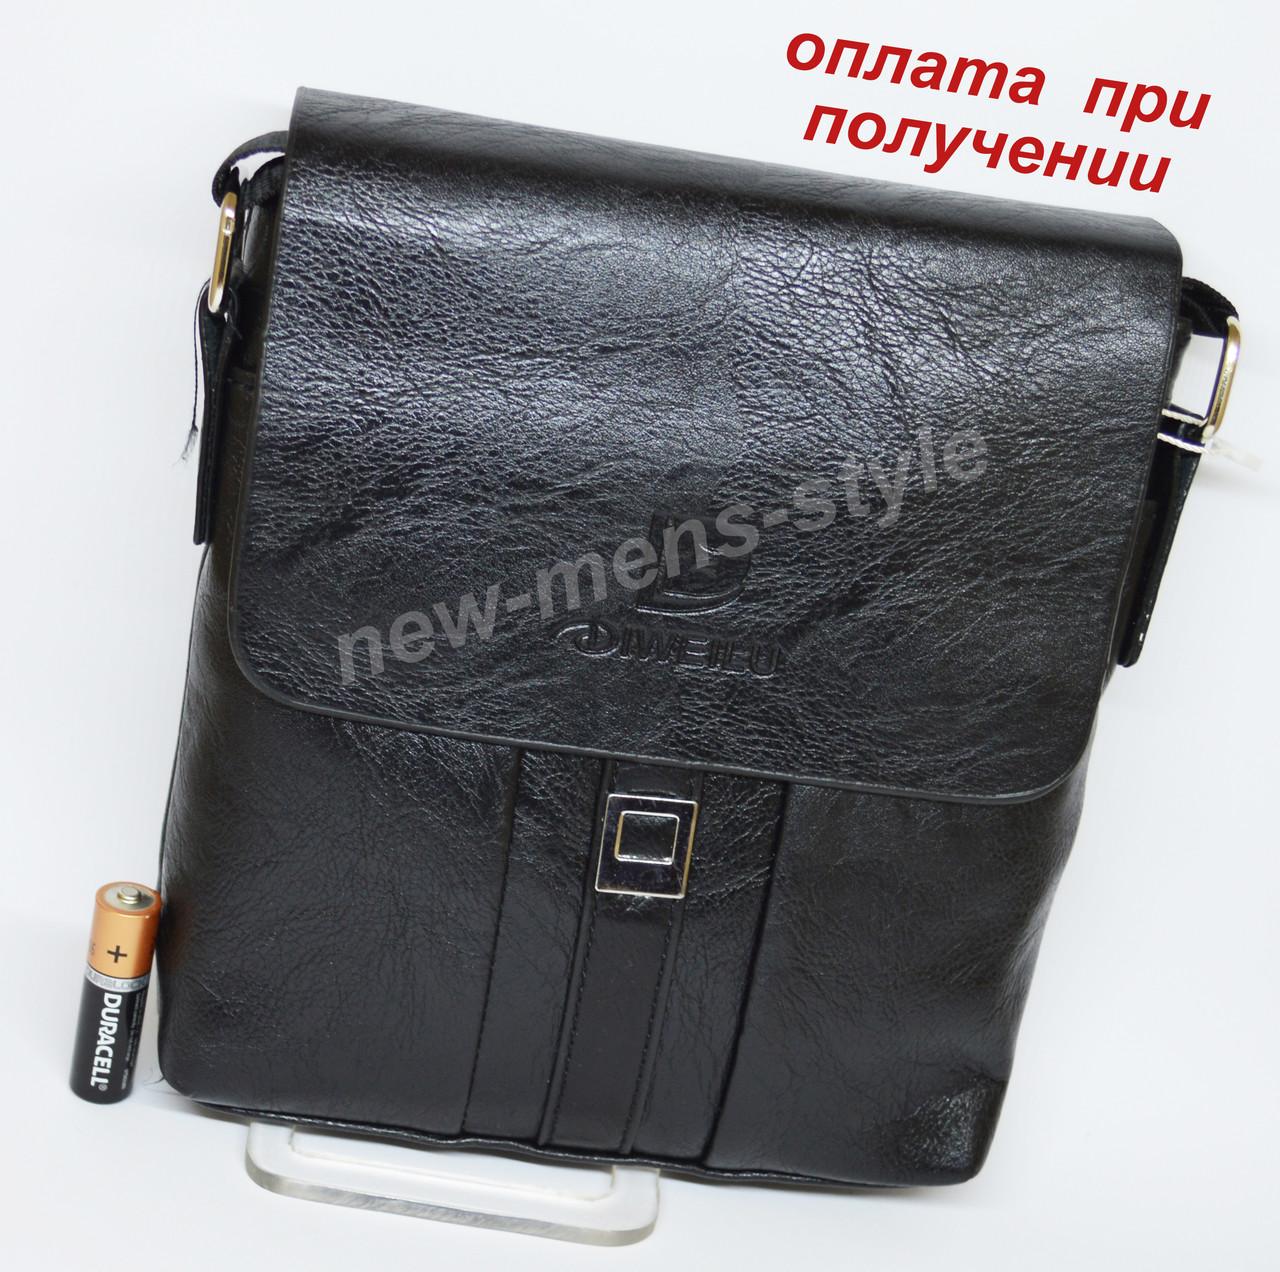 c7d3d52fa53c Мужская чоловіча кожаная сумка барсетка через плечо DIWEILU на подарок -